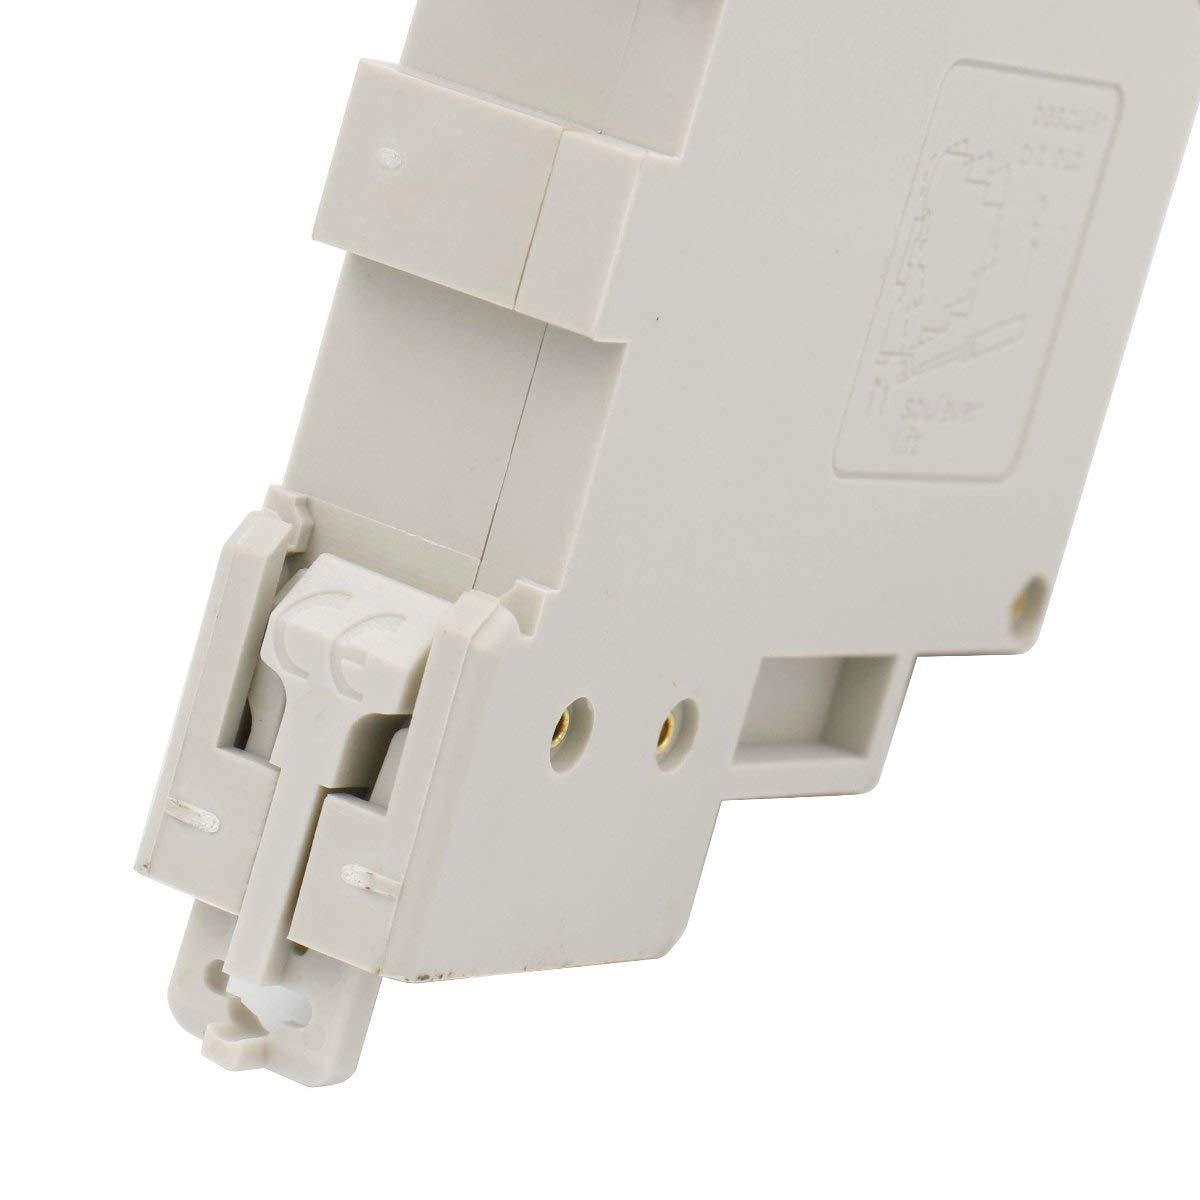 Baomain AC Contactor HC1-25 110V 25A 2 Pole Universal Circuit Control